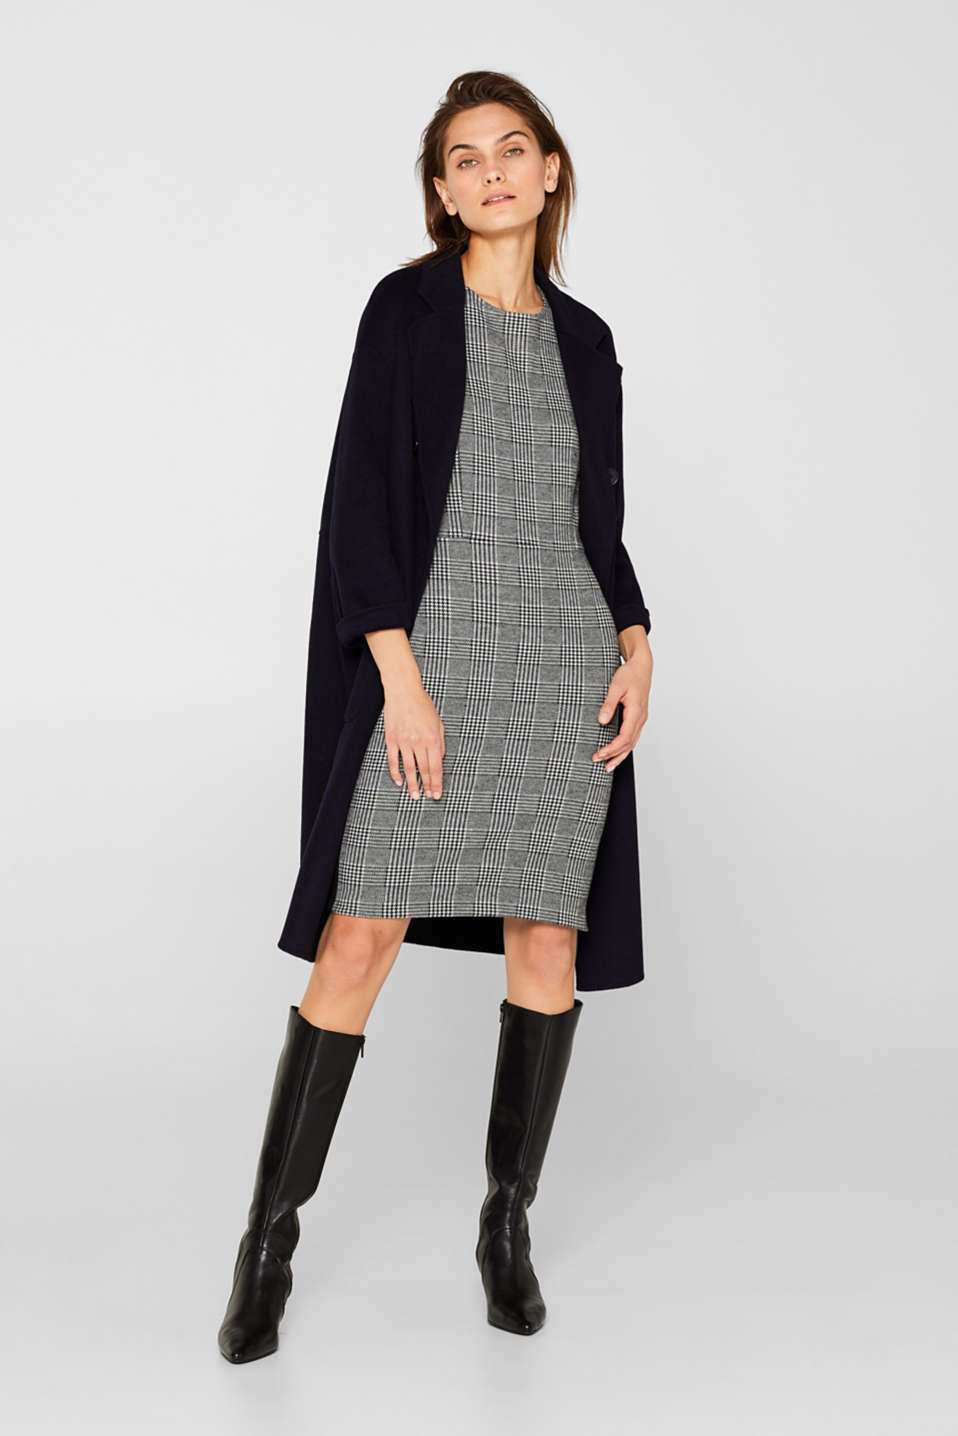 Dresses knitted, BLACK 2, detail image number 1